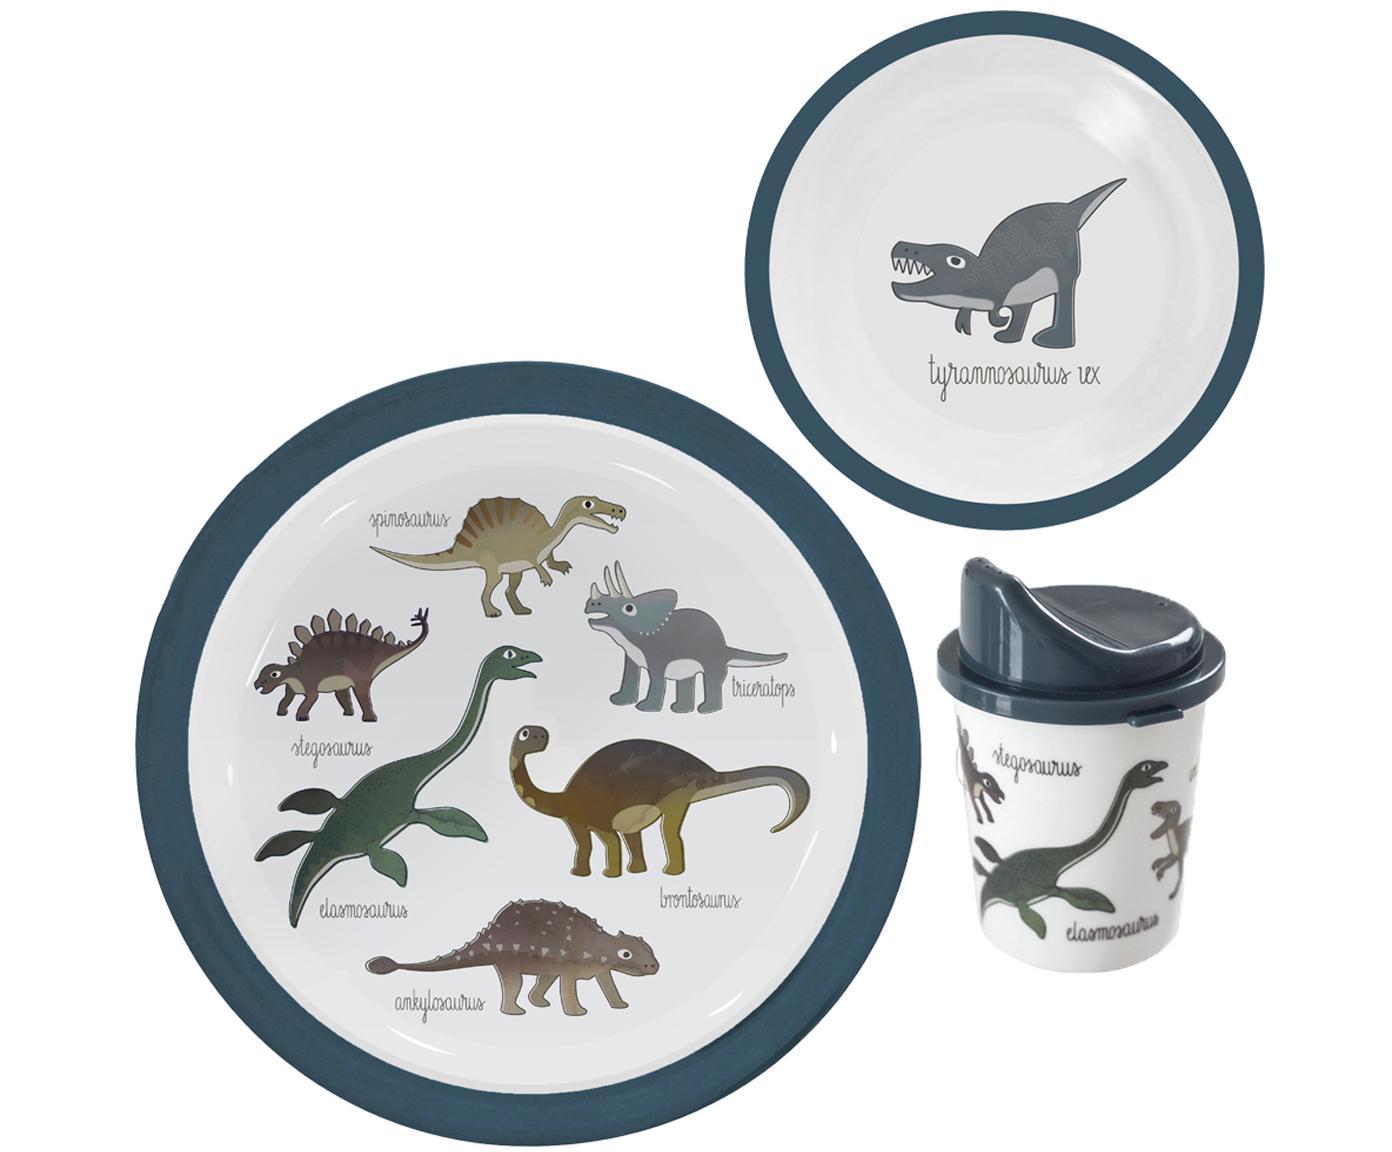 Geschirr-Set Dino, 3-tlg., Melamin, Kunststoff, Mehrfarbig, Sondergrößen